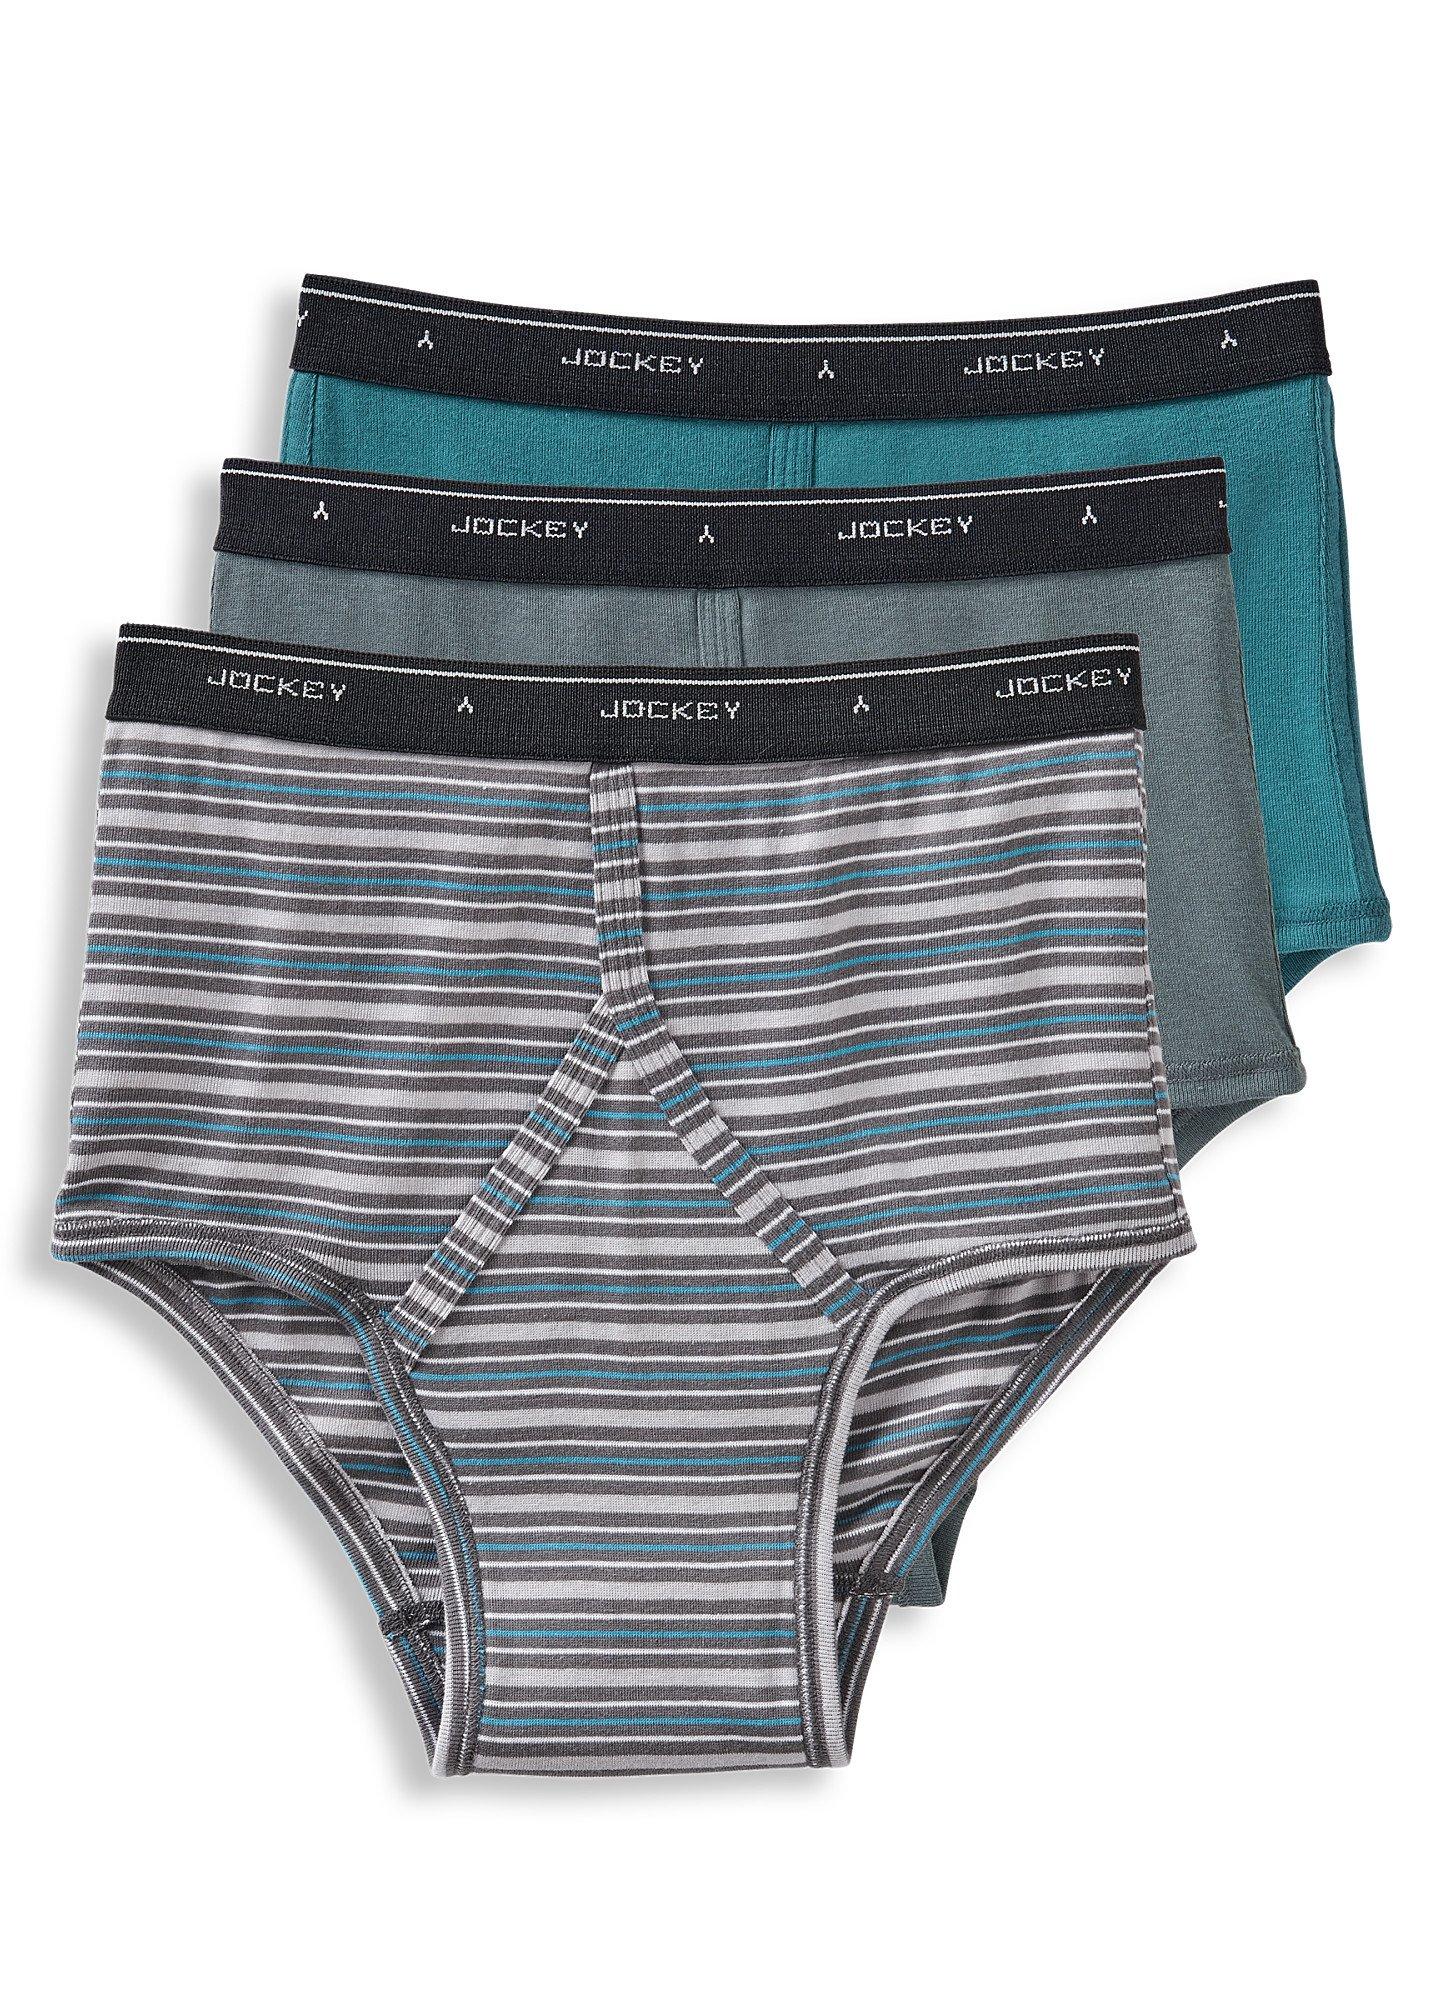 4 Pack Jockey Mens Underwear Classic Full Rise Briefs